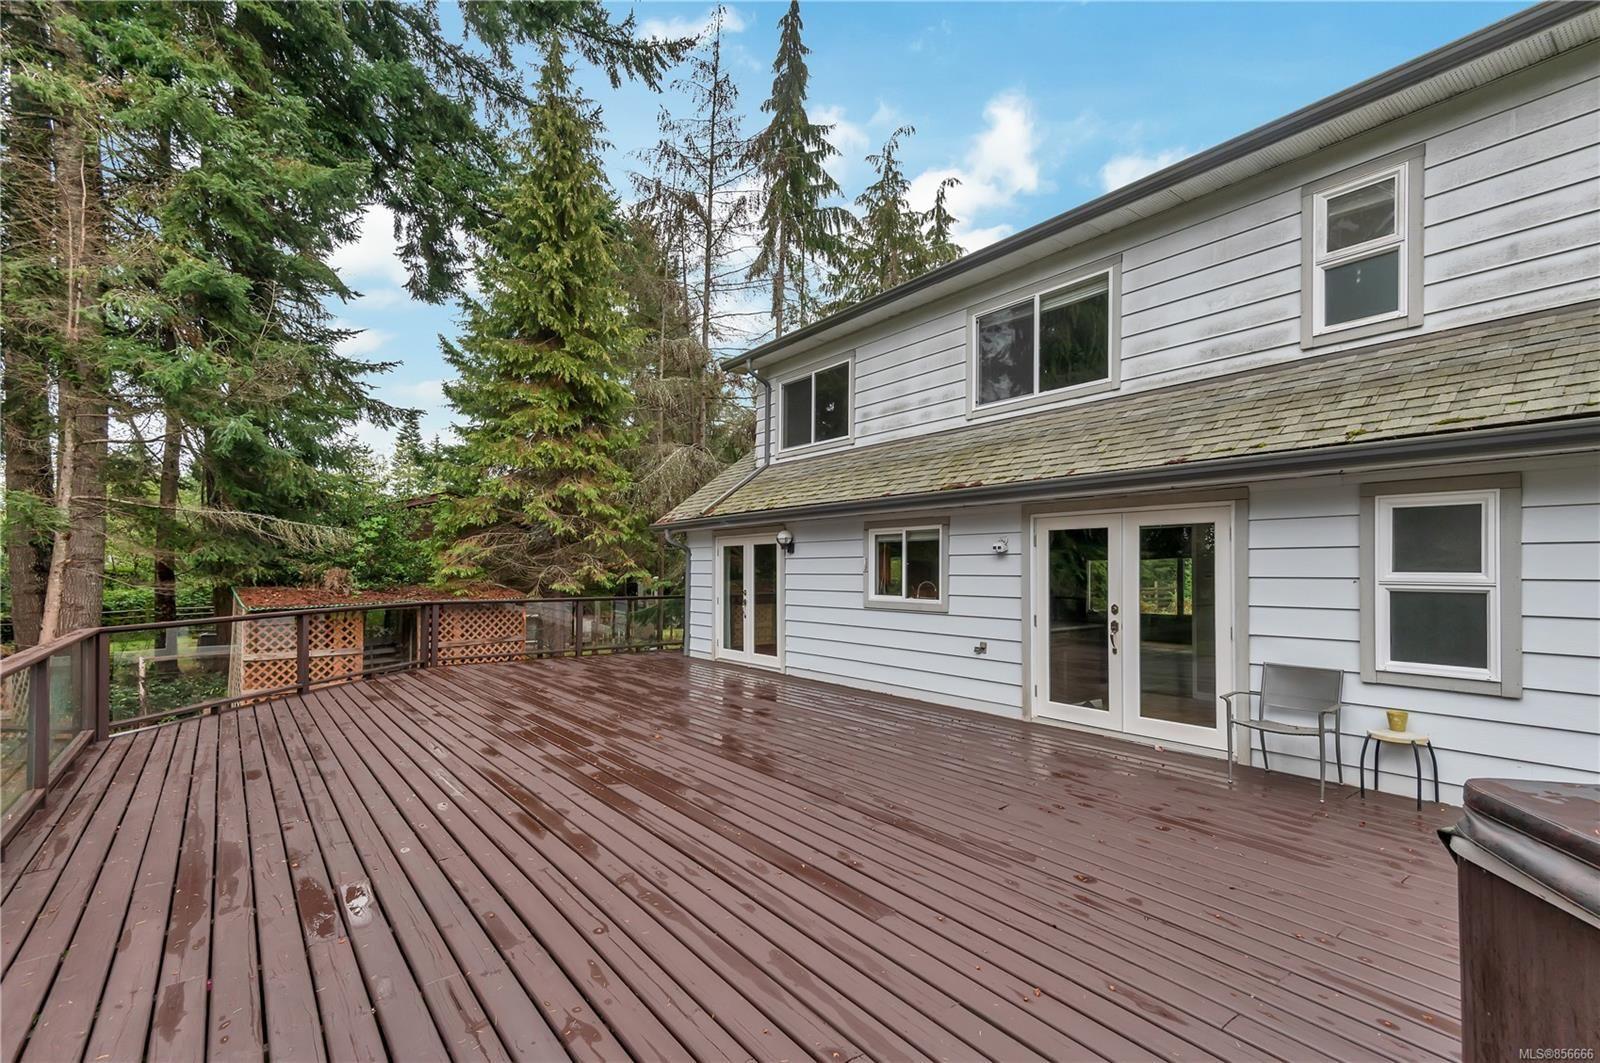 Photo 7: Photos: 2468 Oakes Rd in : CV Merville Black Creek House for sale (Comox Valley)  : MLS®# 856666